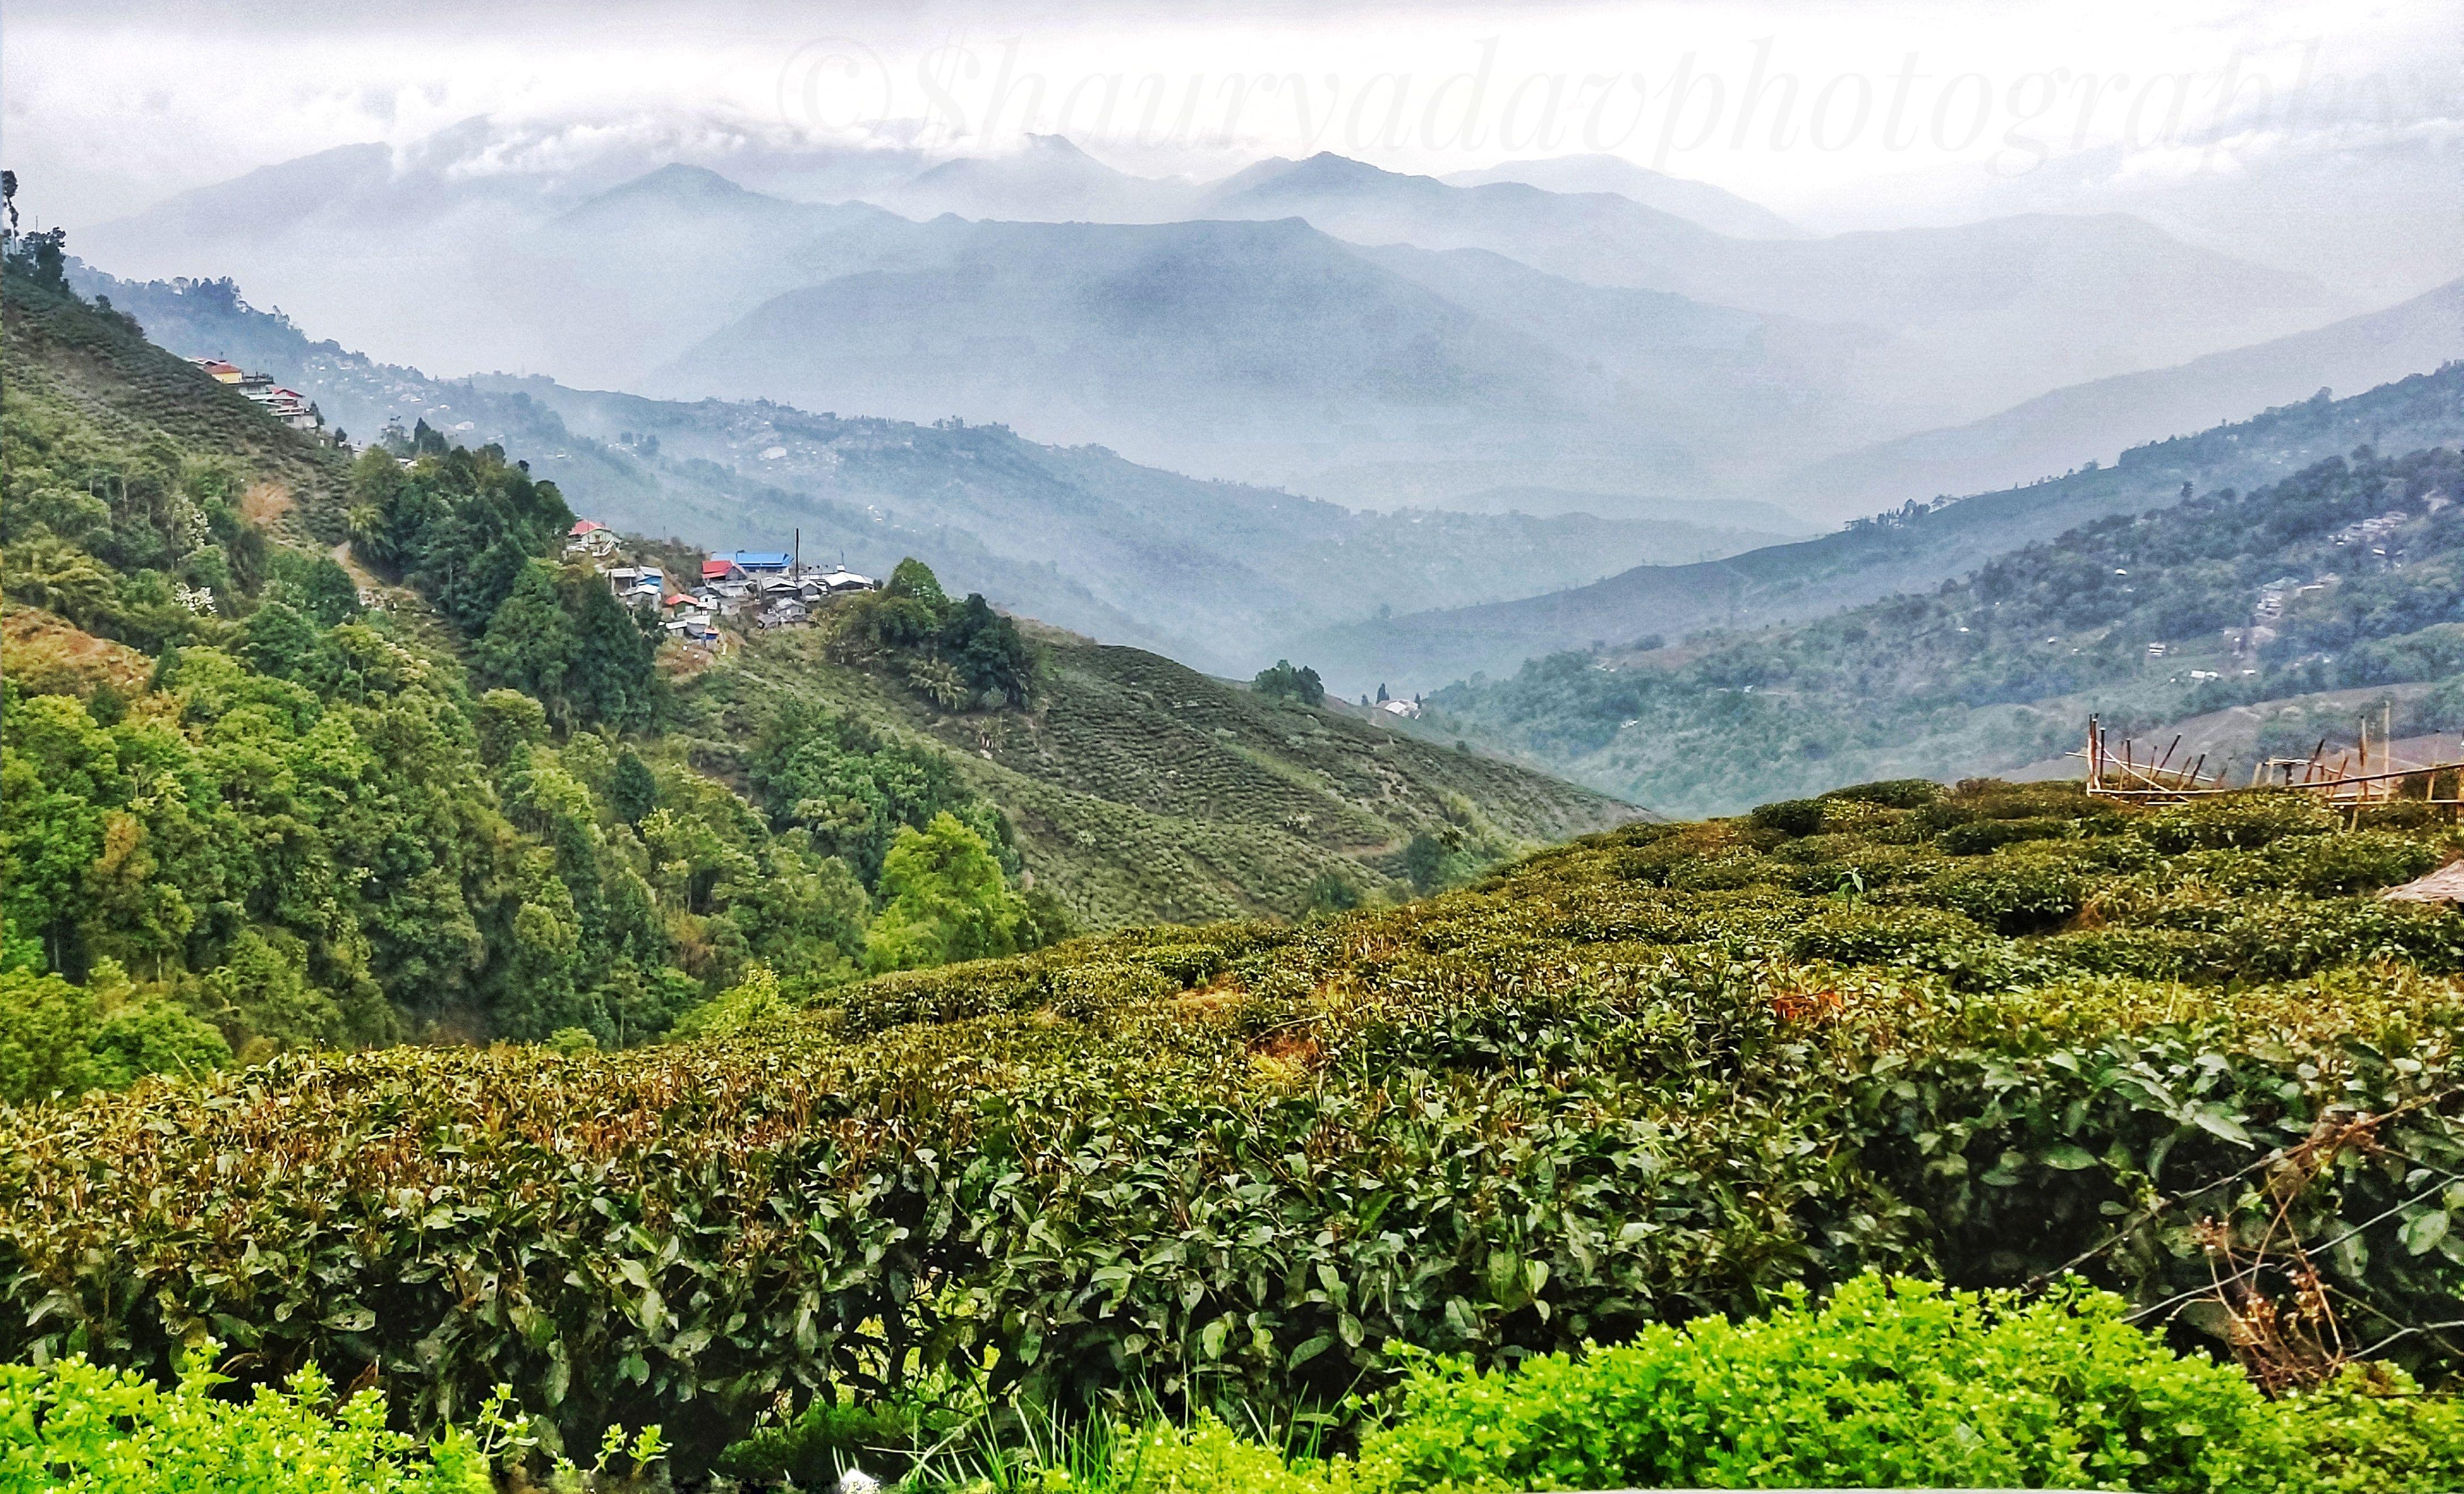 a683064739df177b1a970c5c8cb09d02 - List Of Tea Gardens In Darjeeling